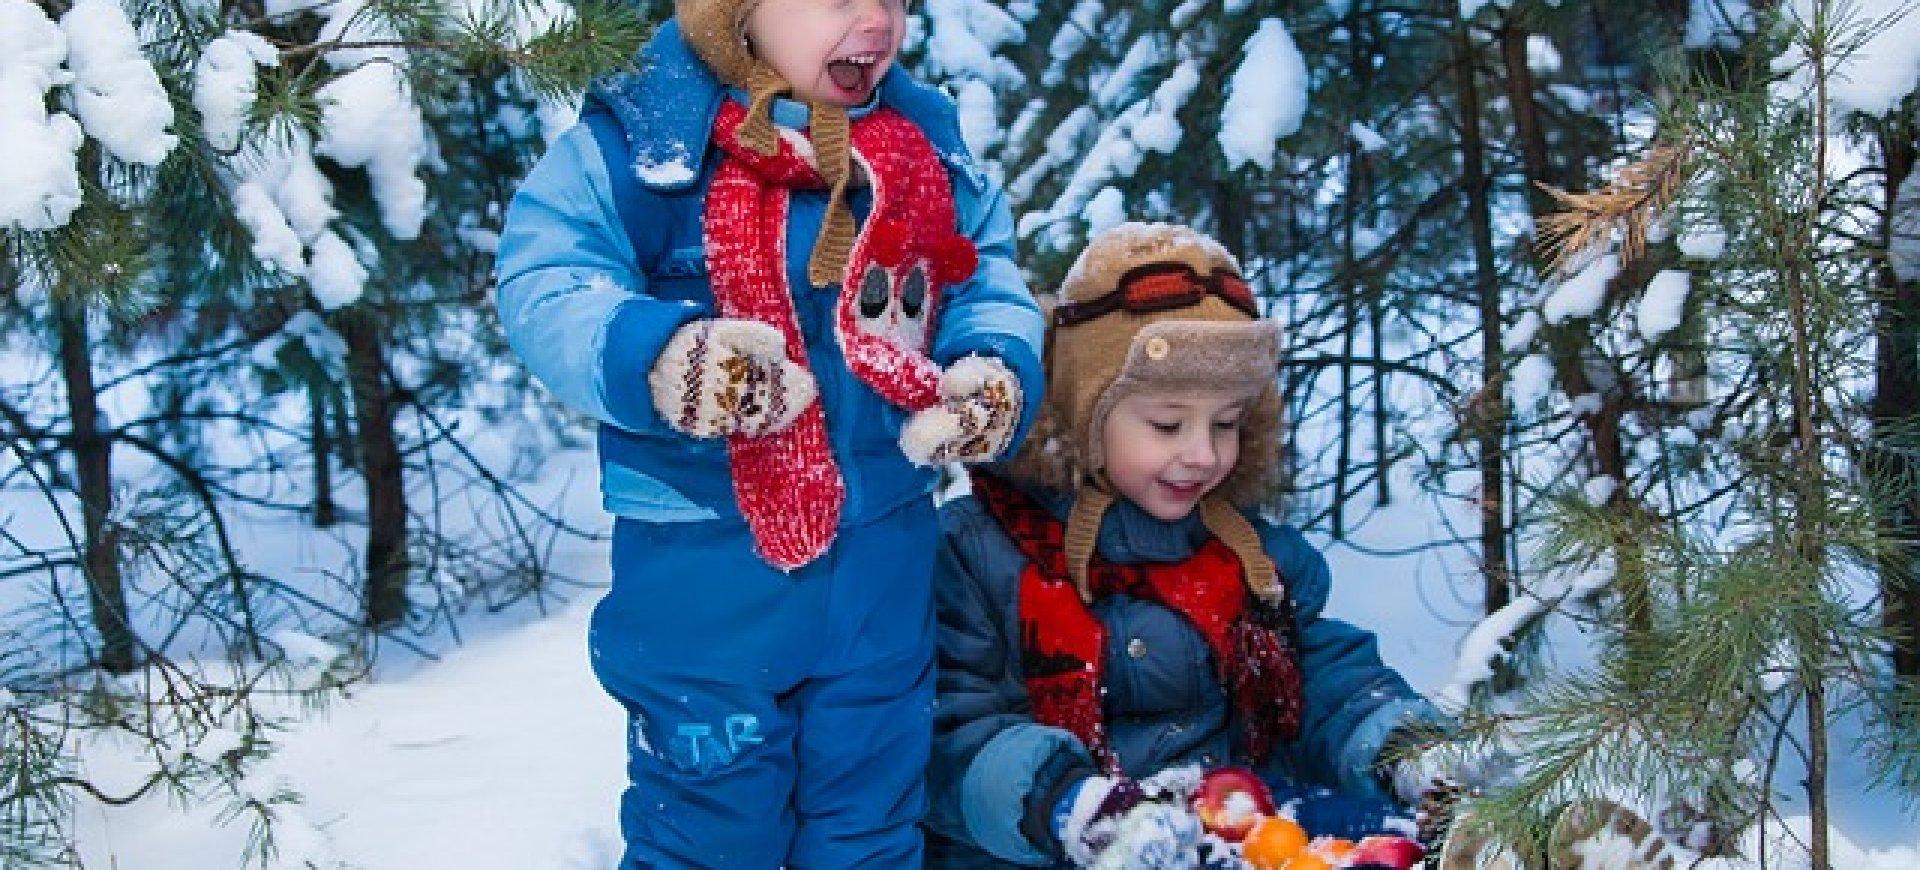 Family holidays 2020 in Sielanka -  Special offer -10%